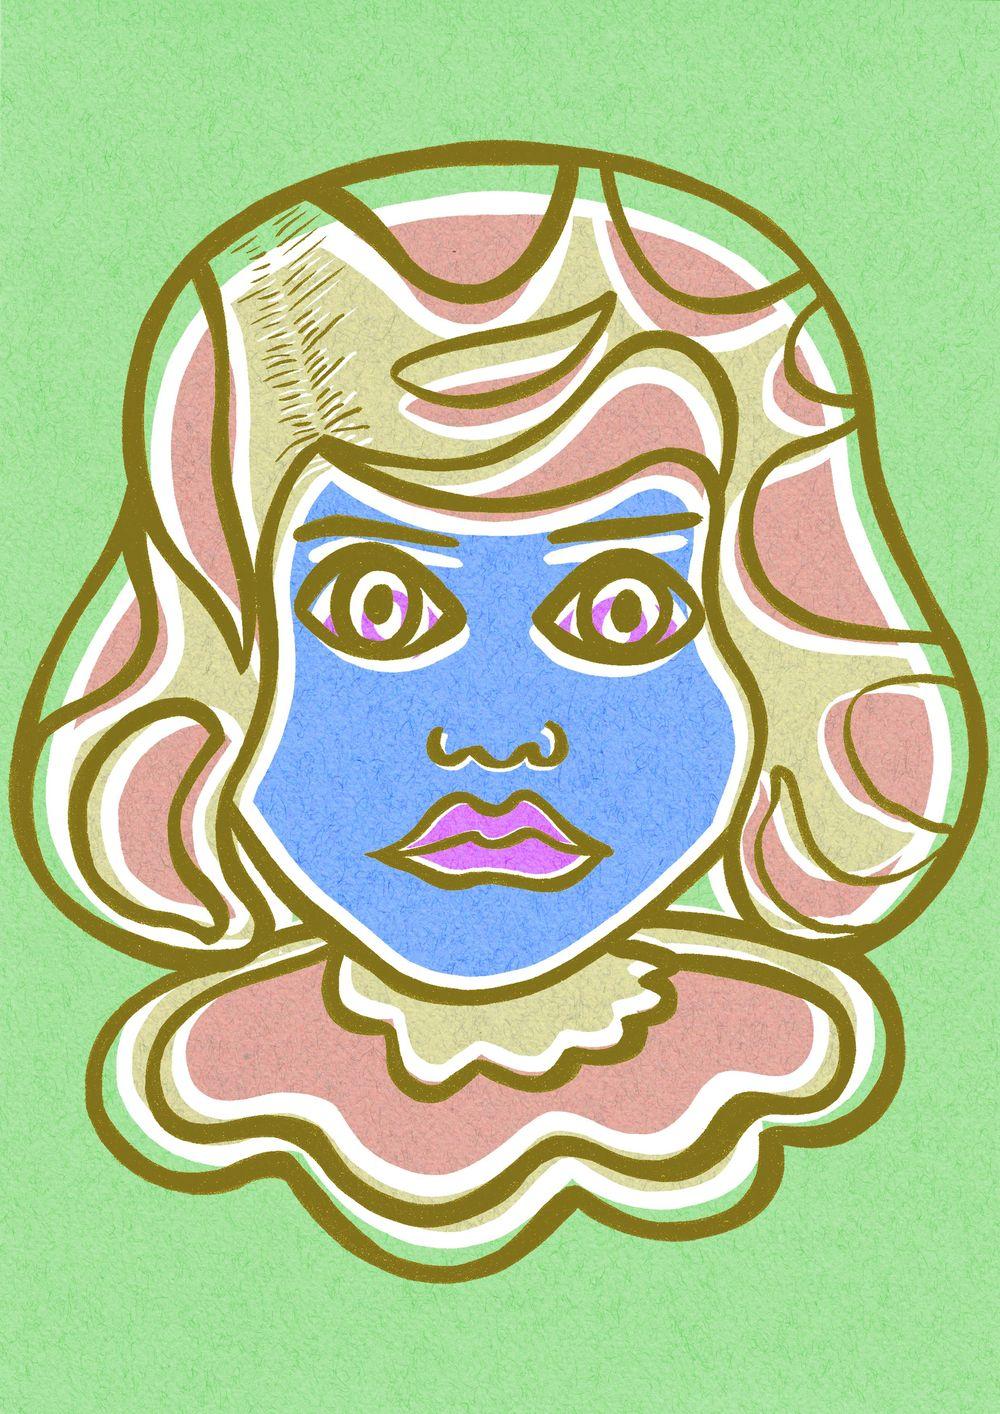 Pop art Girl - image 6 - student project